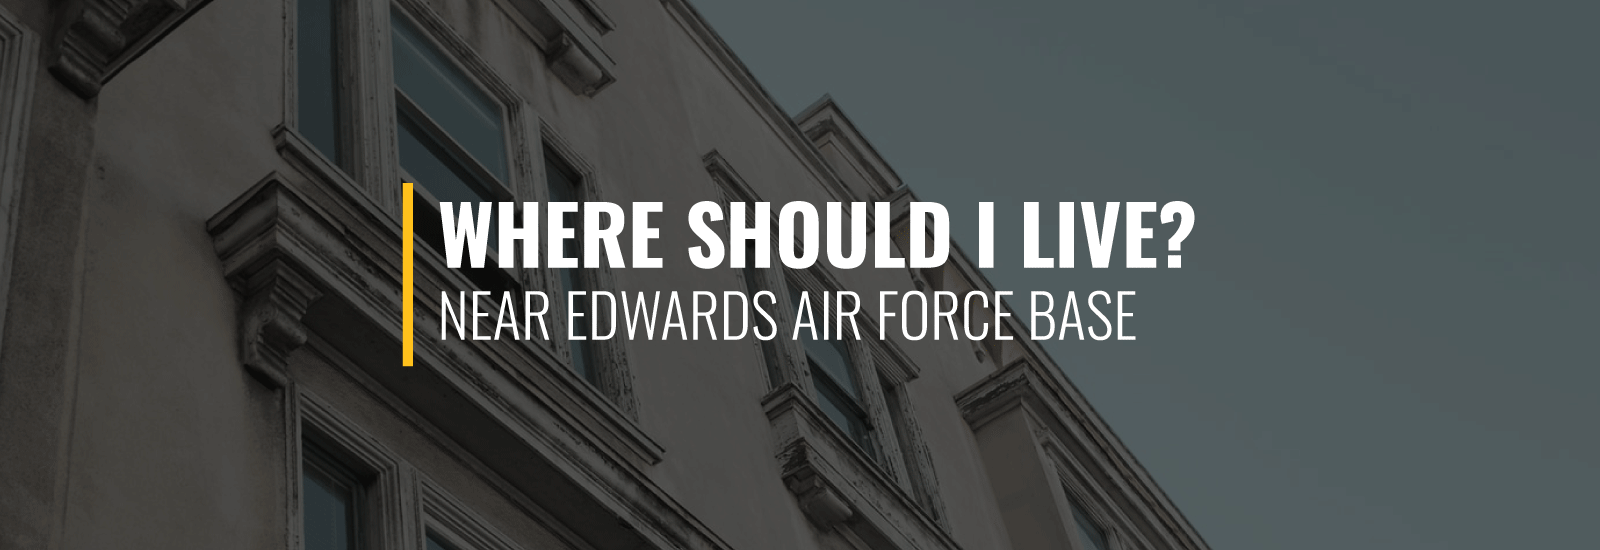 Where Should I Live Near Edwards AFB?